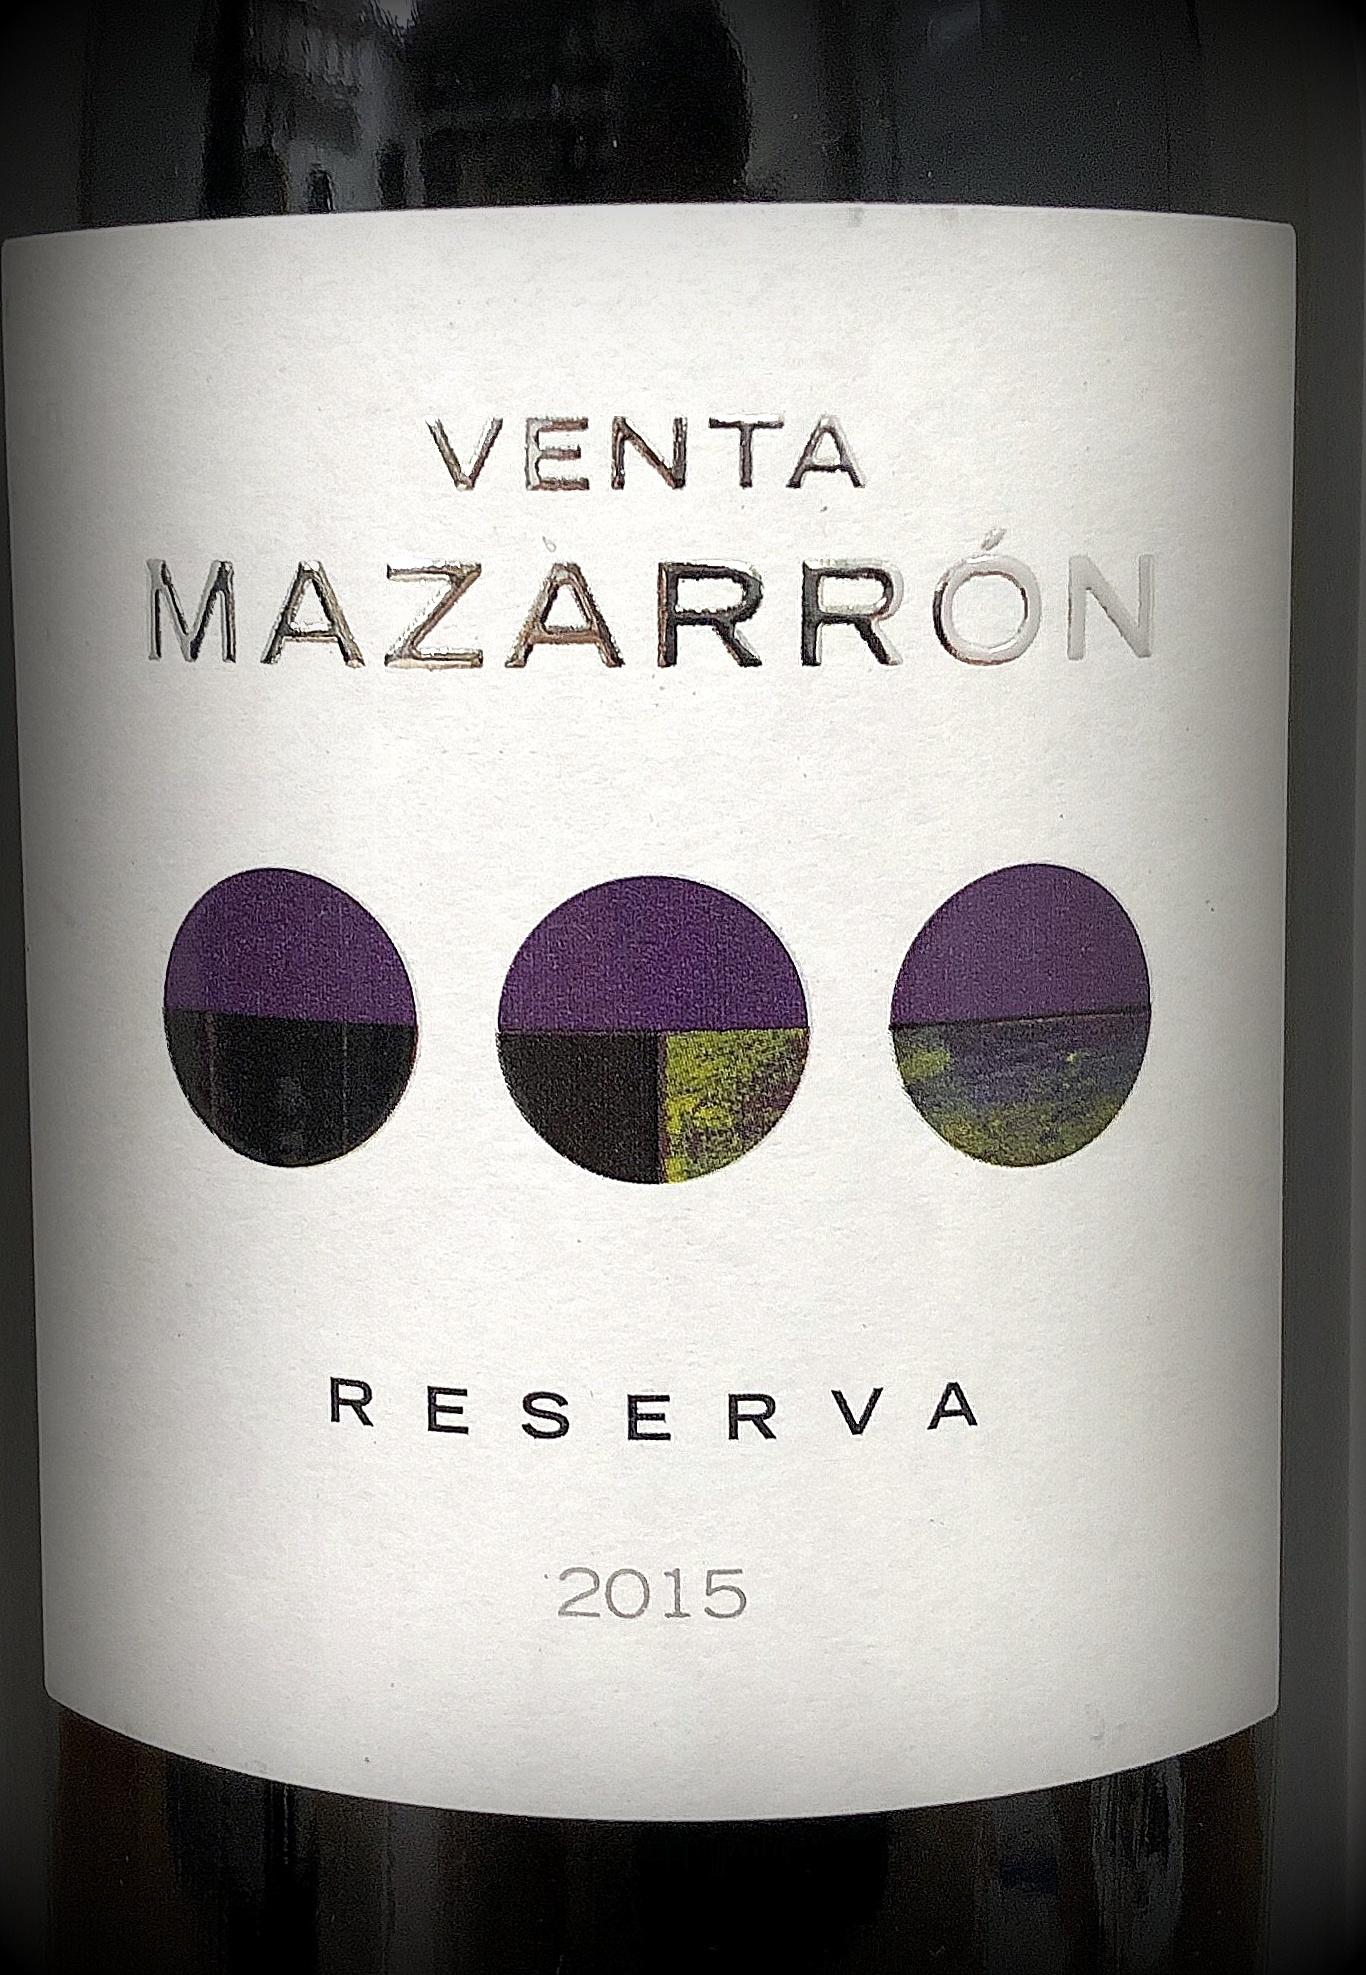 Venta Mazarrón Reserva